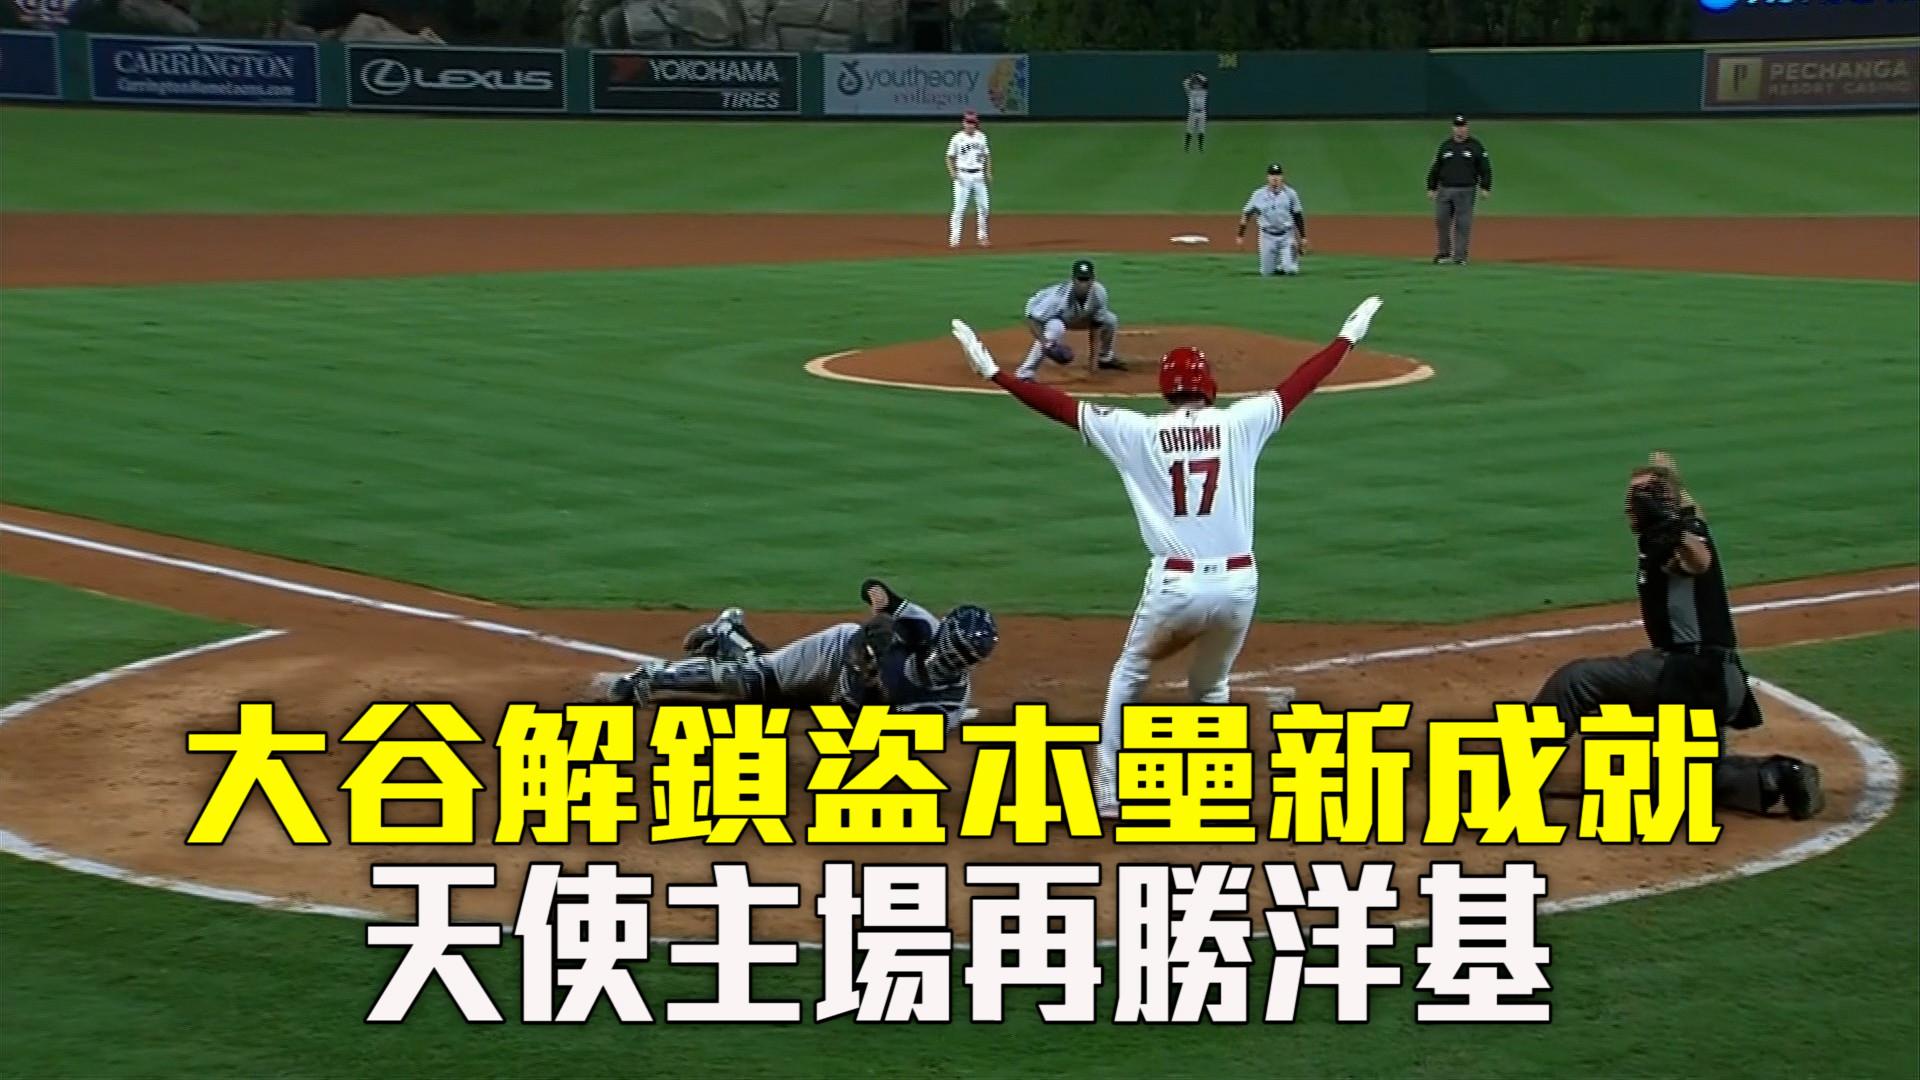 【MLB看愛爾達】瑞佐開轟洋基先得分 沃許三分砲反擊 09/01